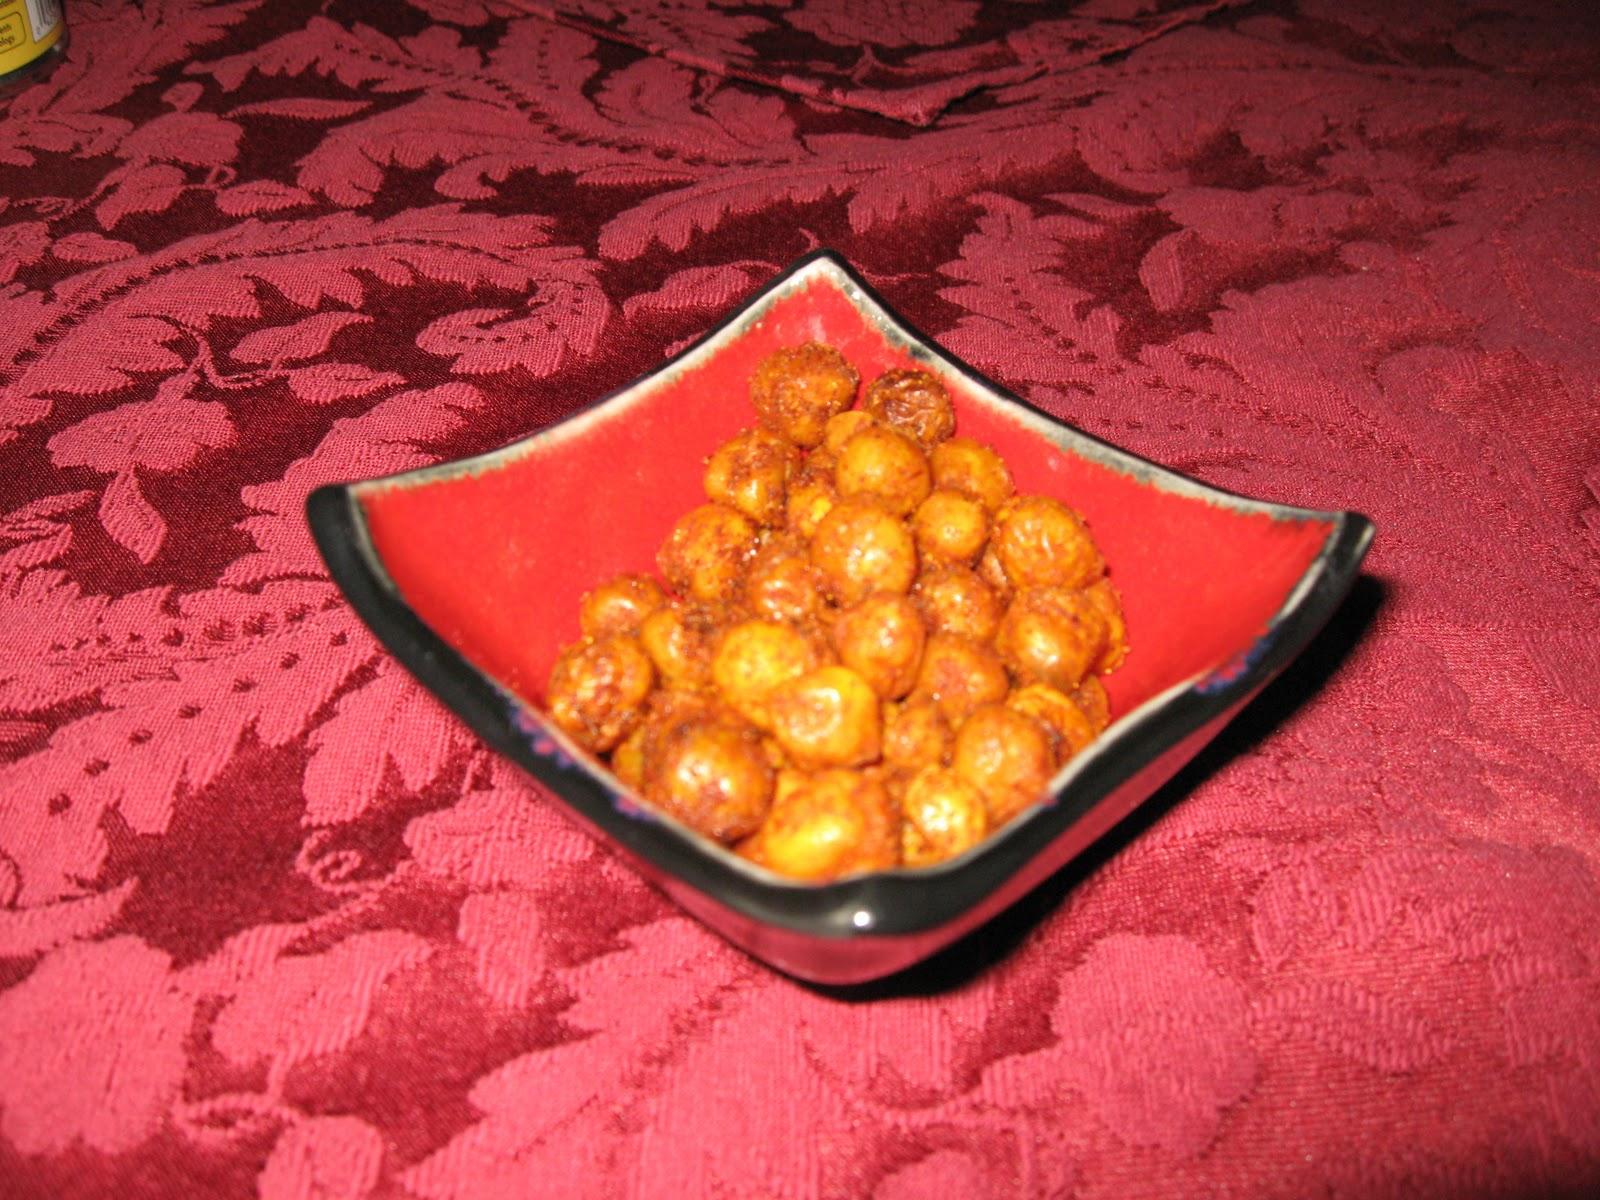 ... Culinary Amnesia: A Trio of: Party Snacks. Oven-Fried Cajun Chickpeas